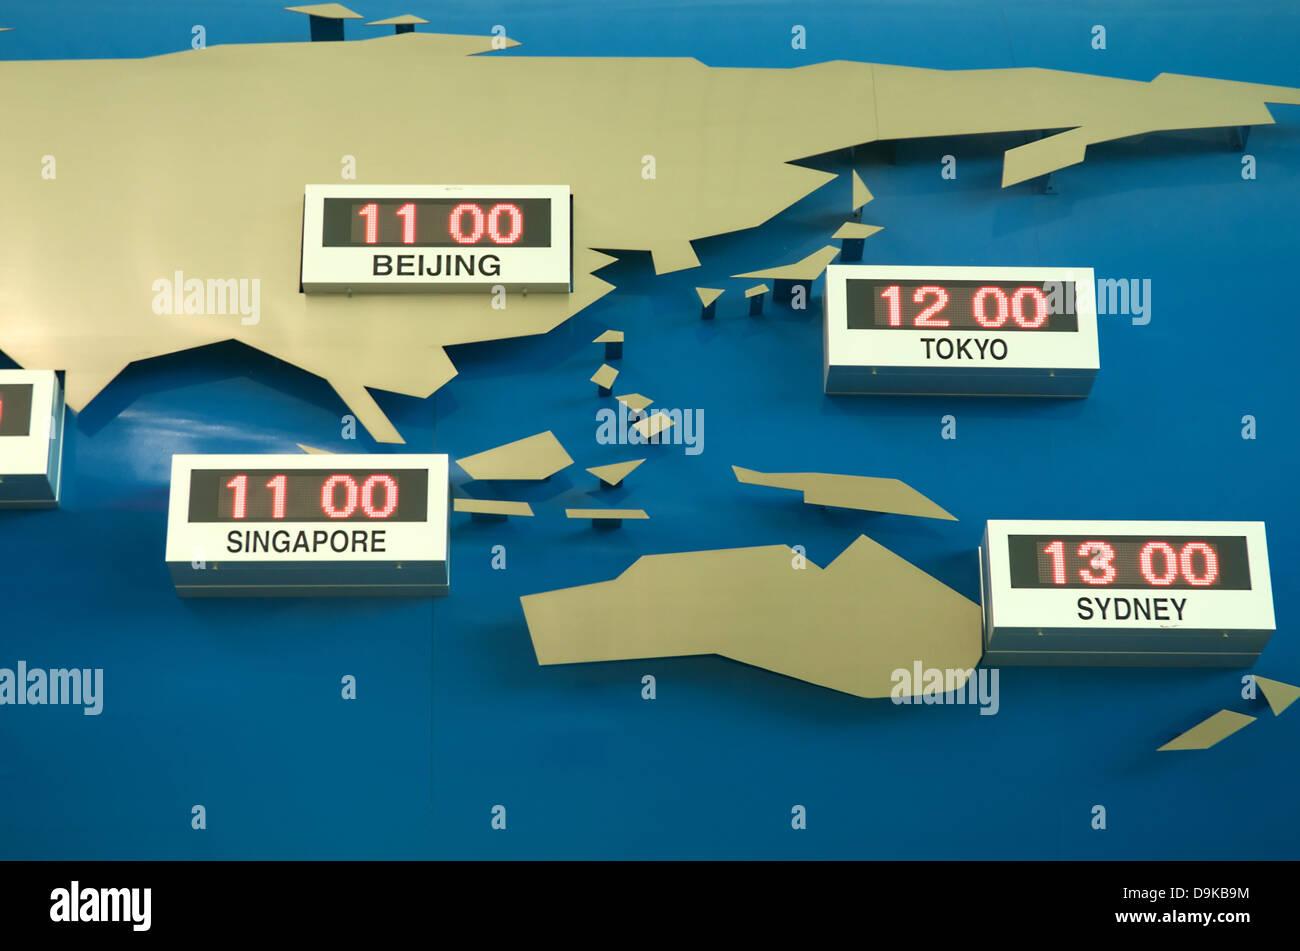 World Time Zone Map Australia Stock Photos & World Time Zone Map ...